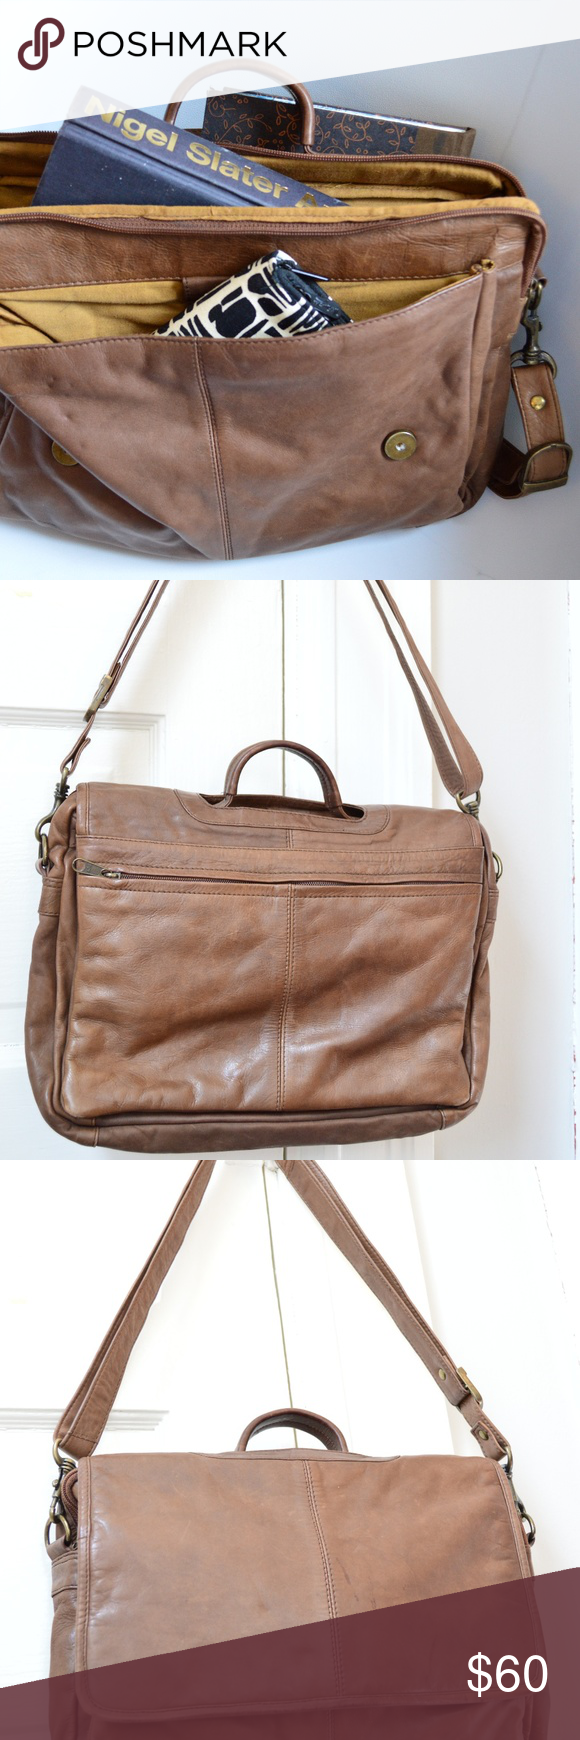 Vintage Wilson's Leather Satchel Wilsons leather bag